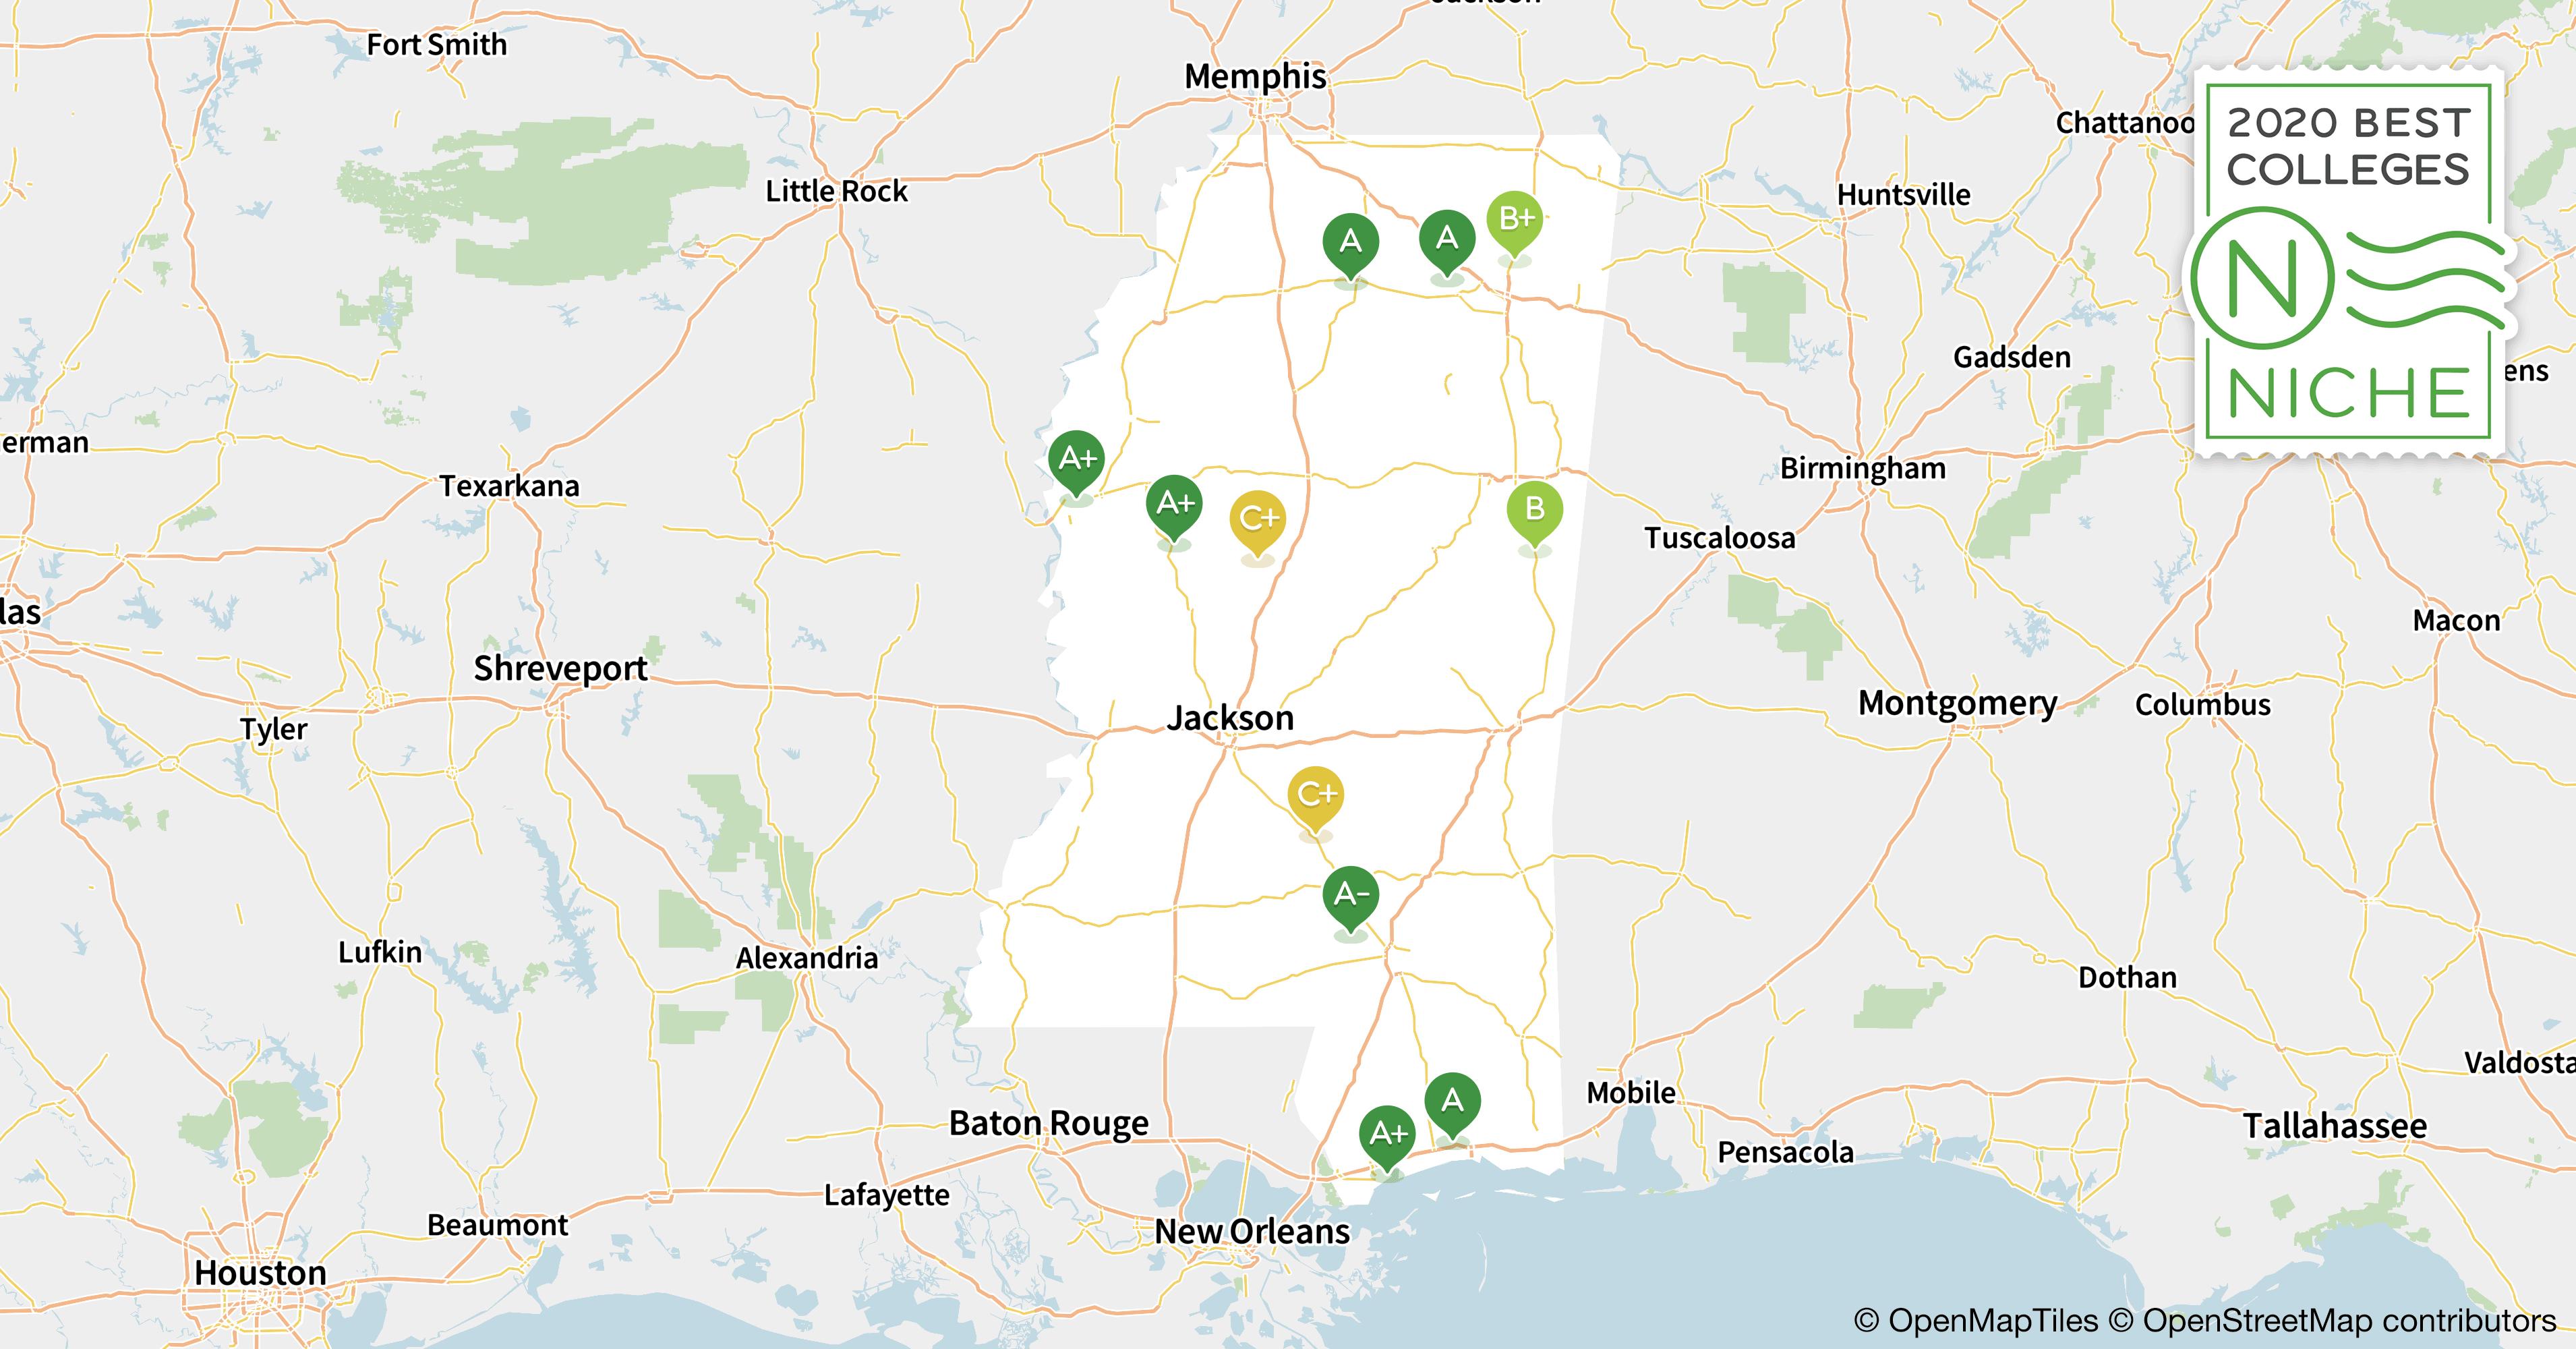 2020 Best Colleges in Mississippi - Niche